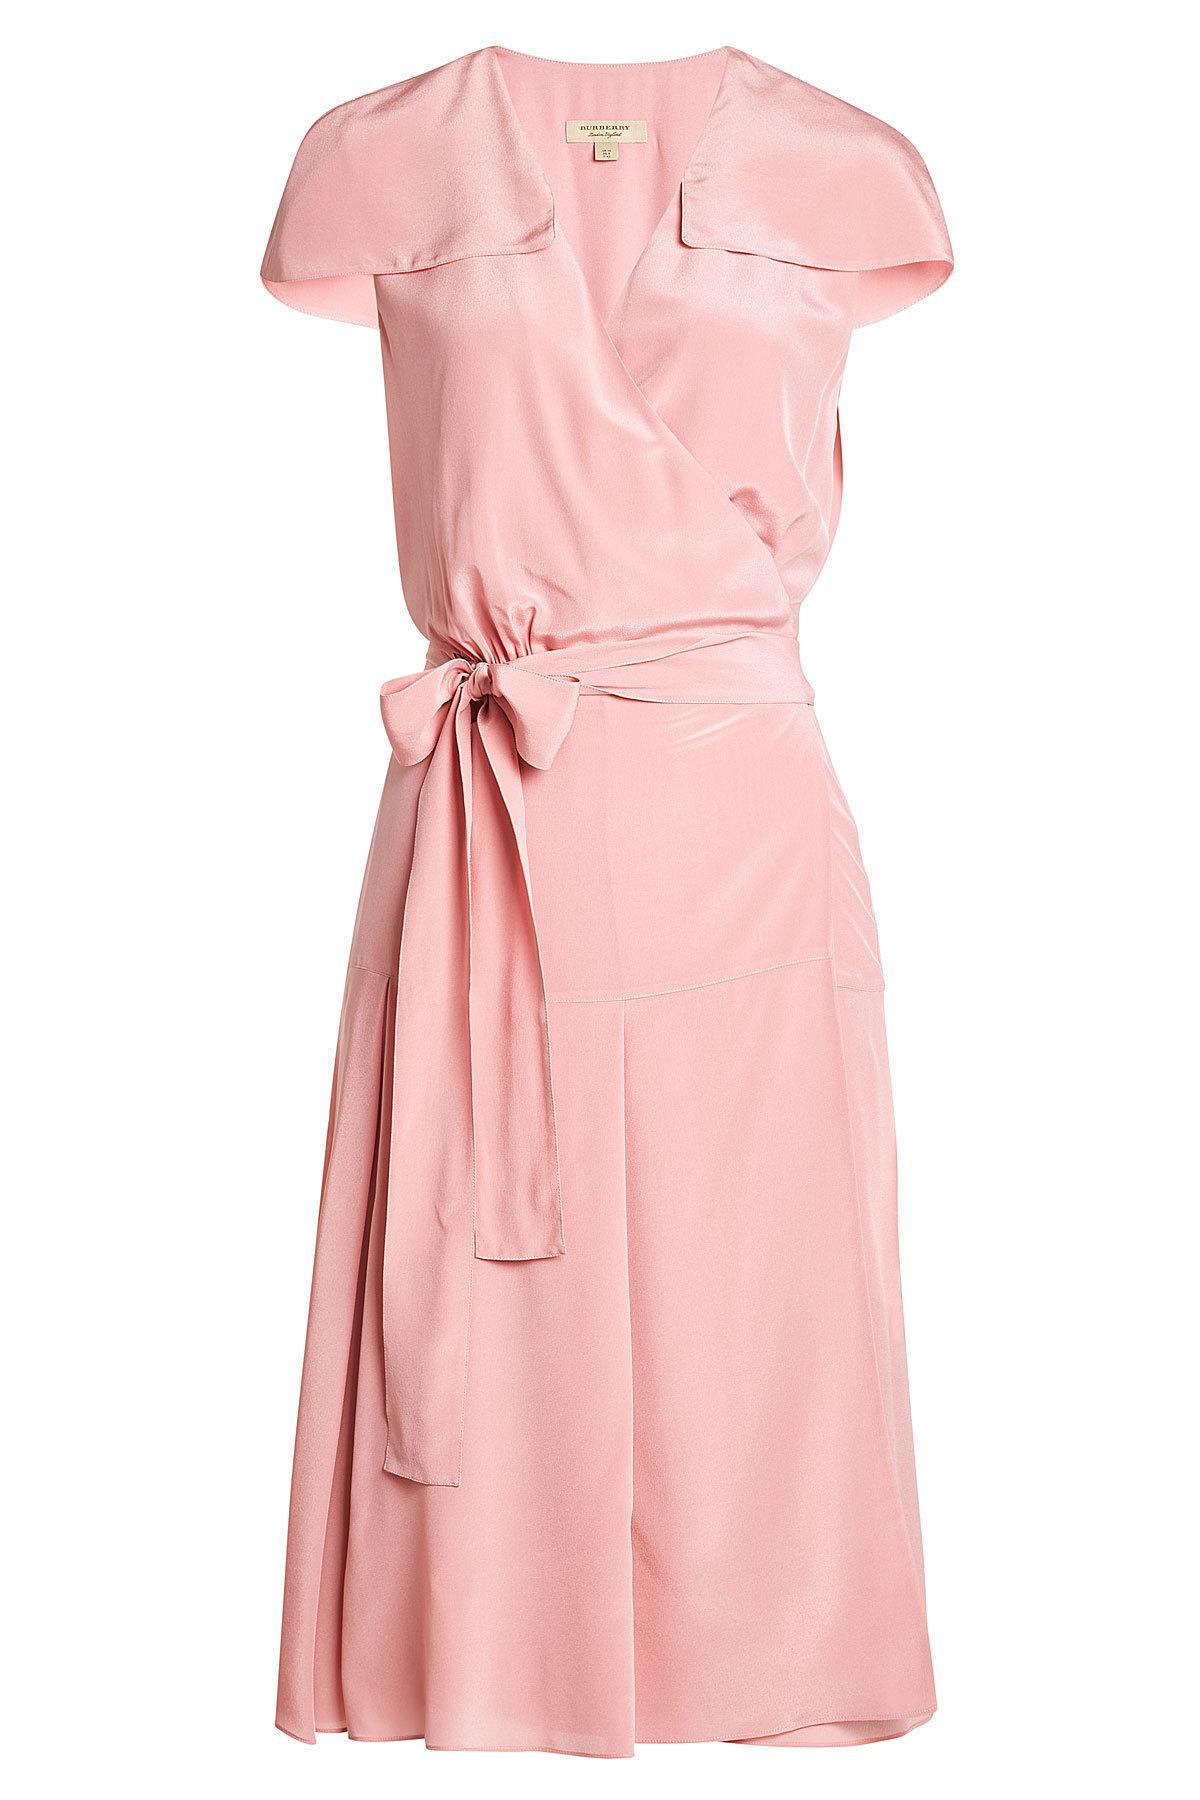 Lyst - Robe en soie Burberry en coloris Rose 7af3c64300f